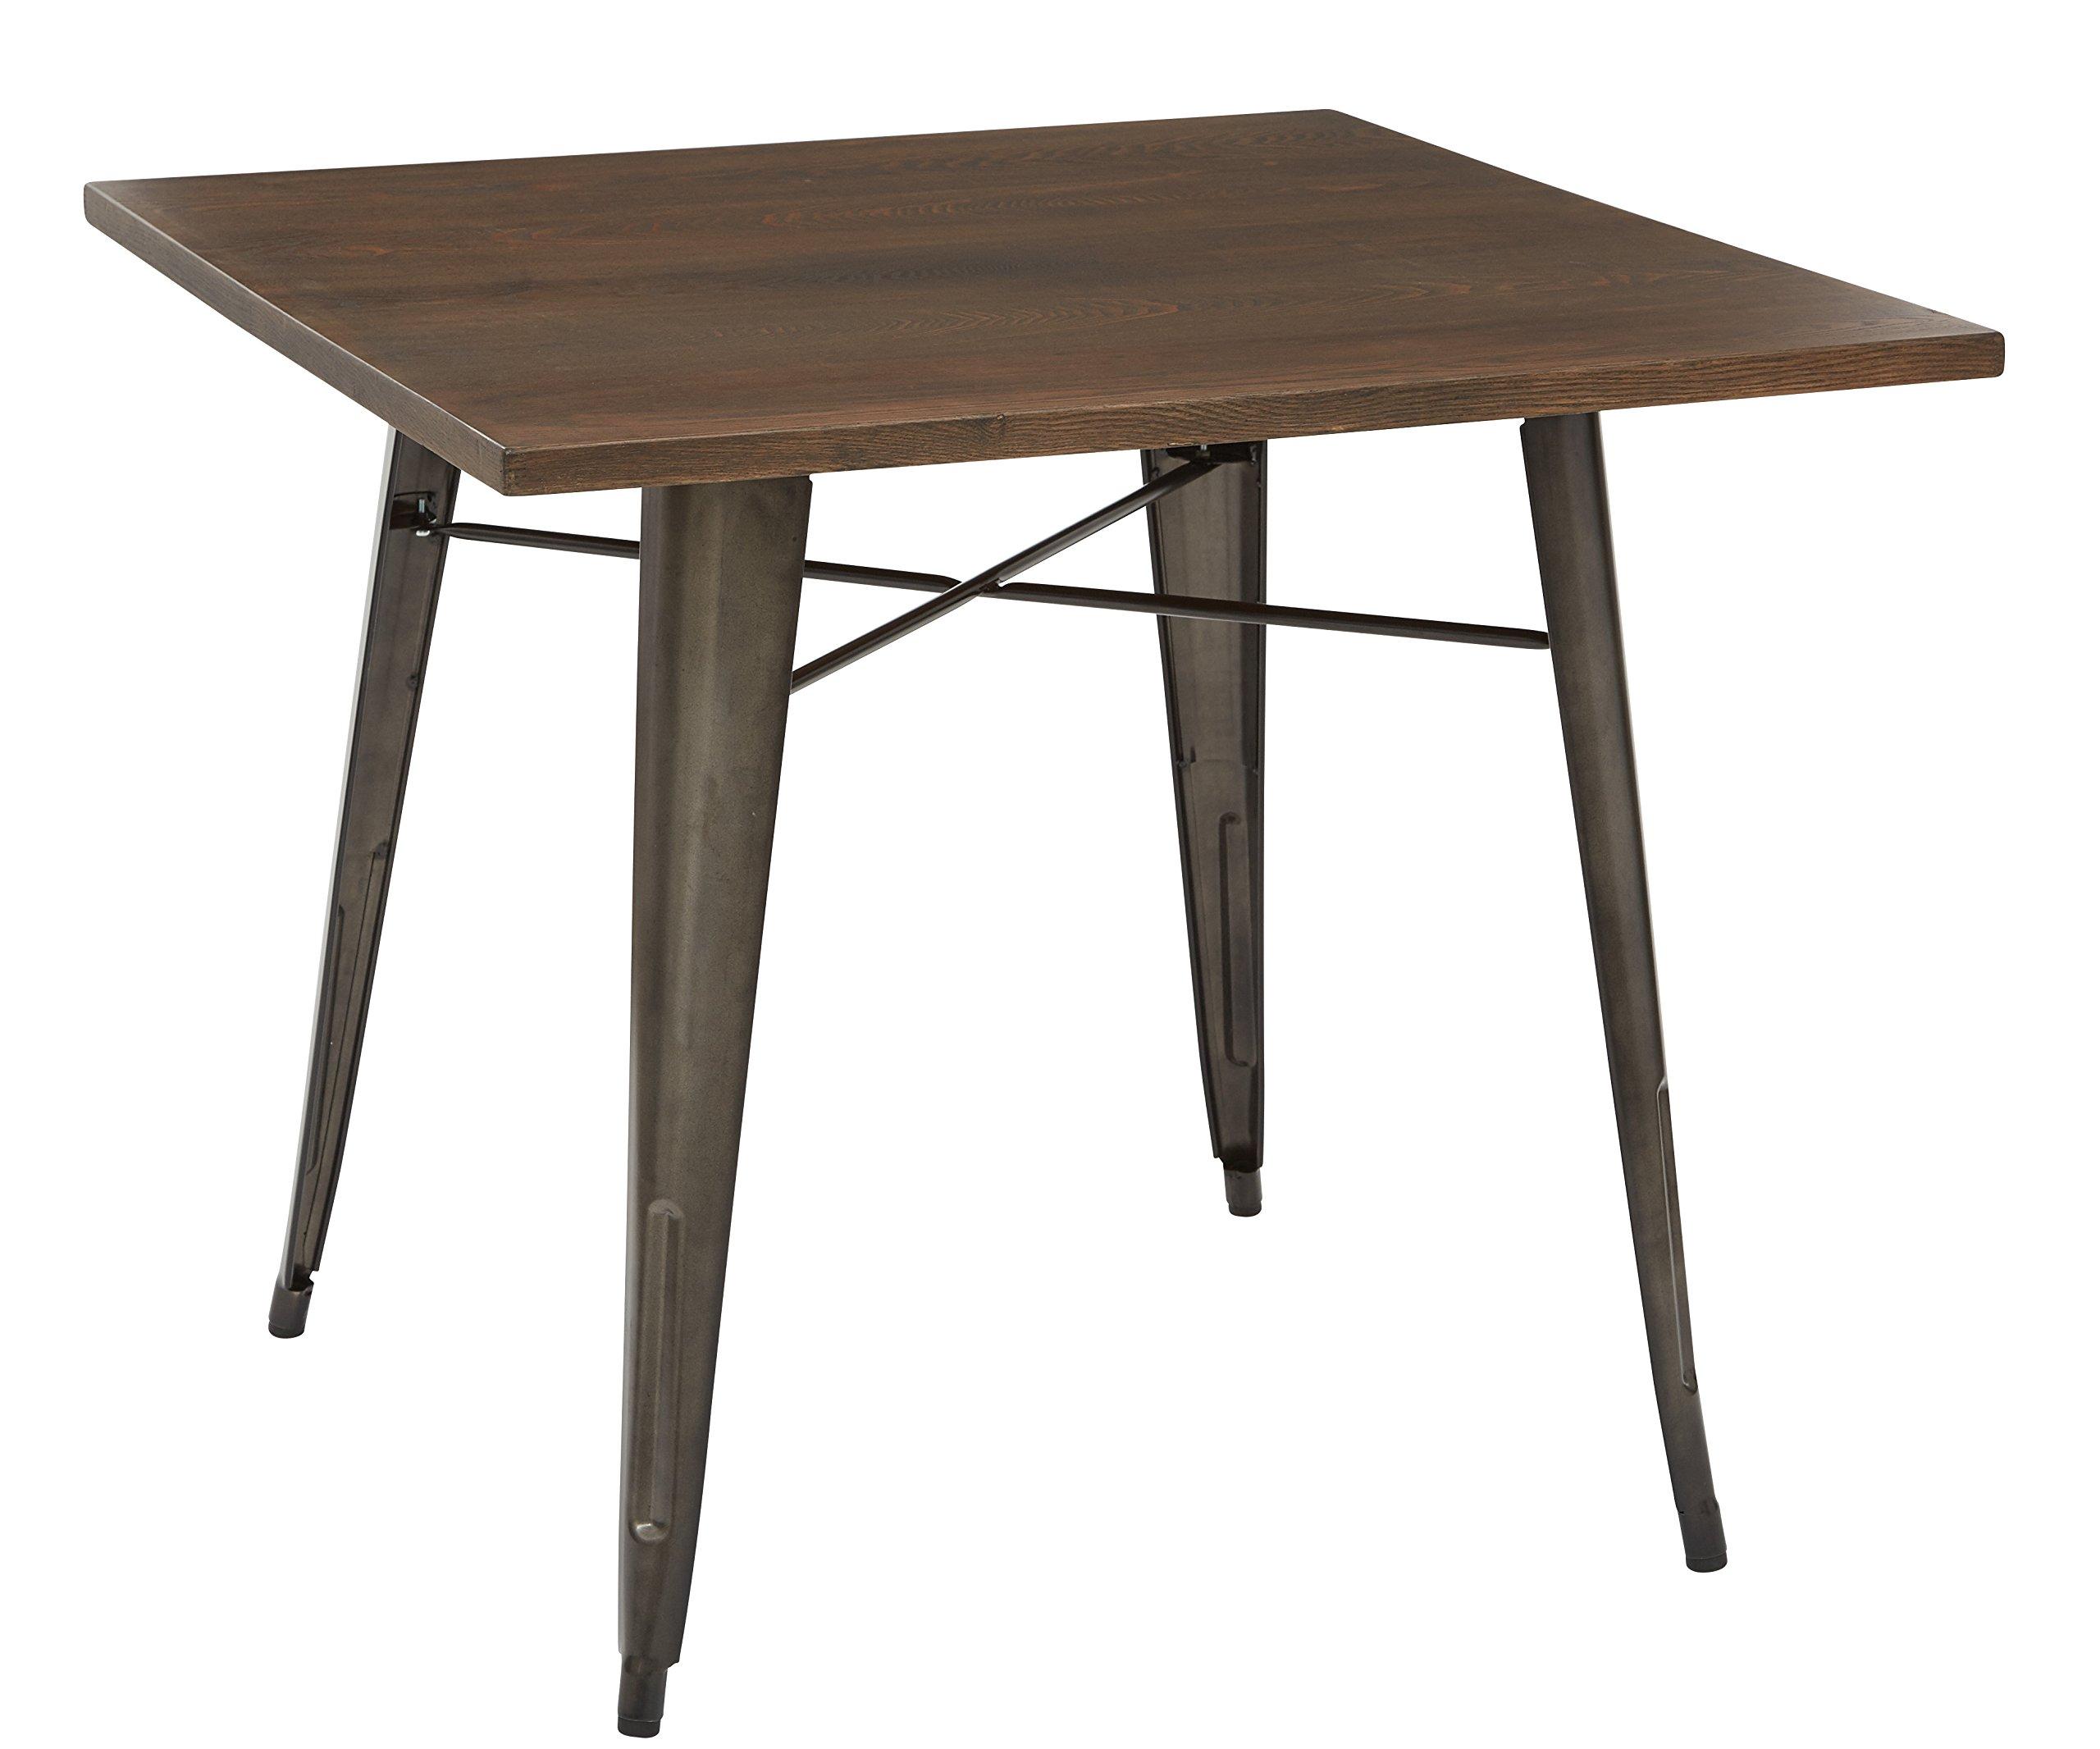 OSP Designs Indio Metal with Frame Finish and Veneer Table Top, Matte Gunmetal/Walnut